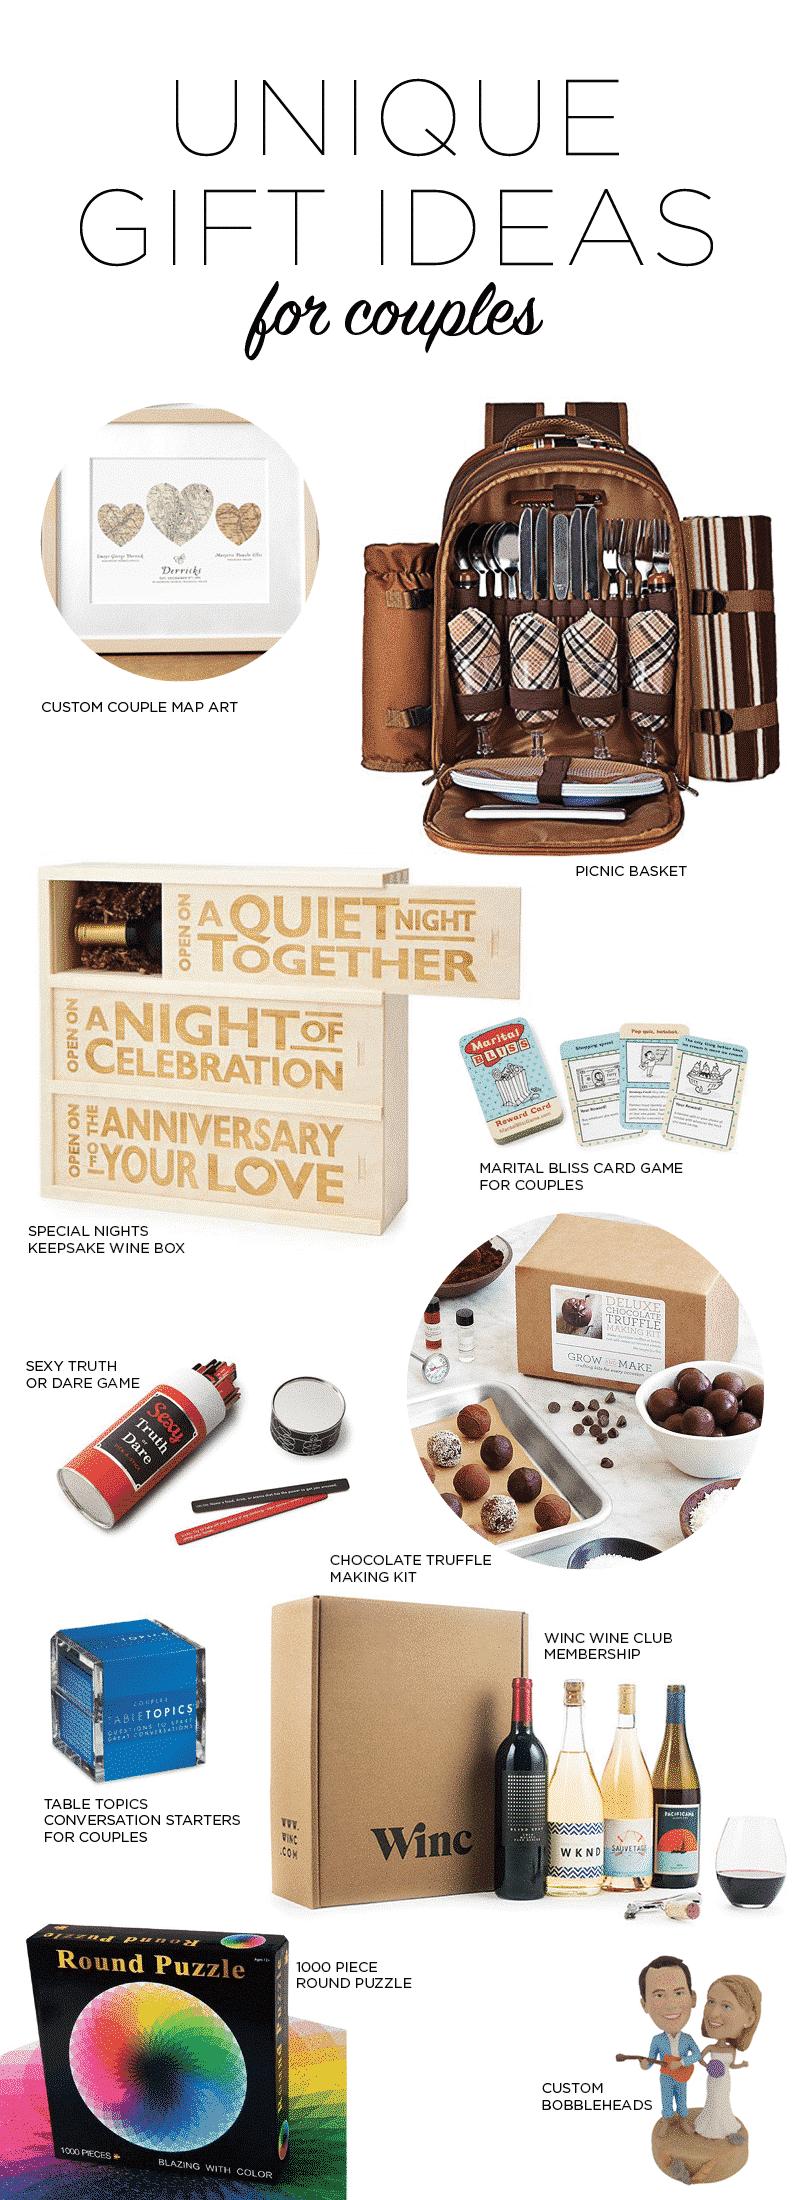 unique gift ideas for couples